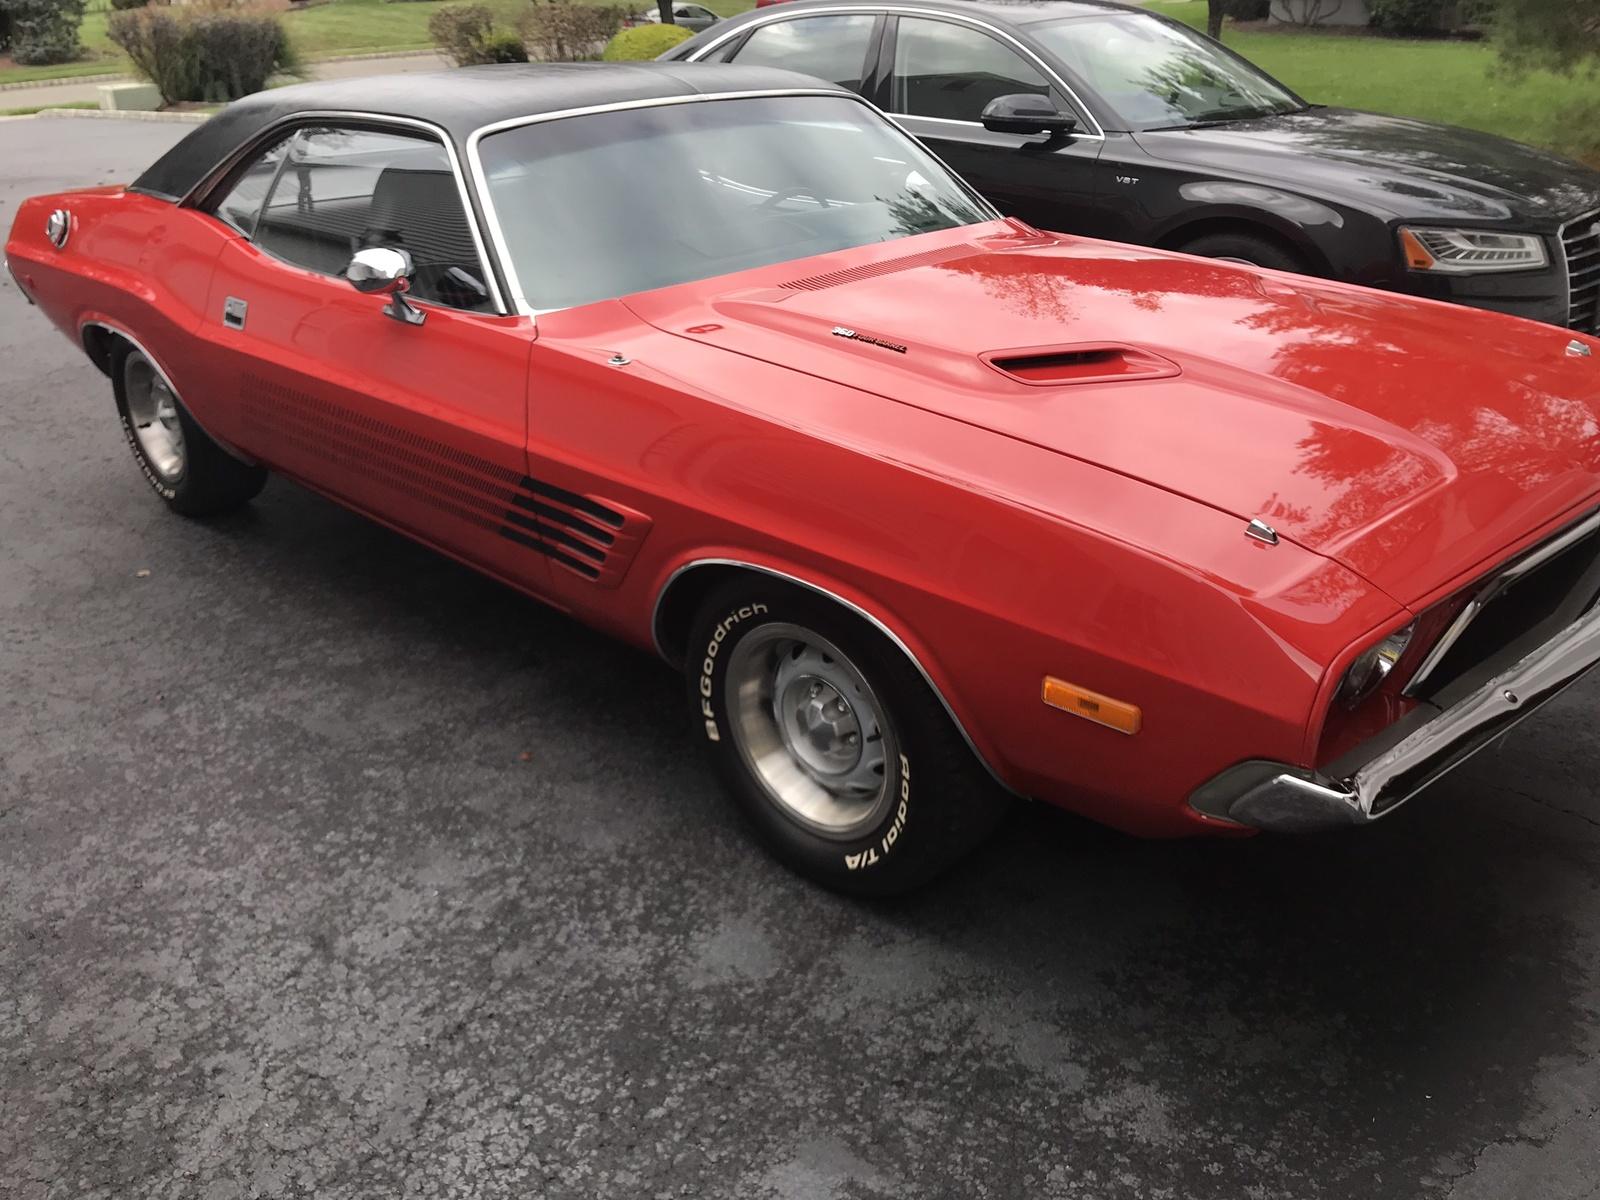 1974 Dodge Challenger - Overview - CarGurus